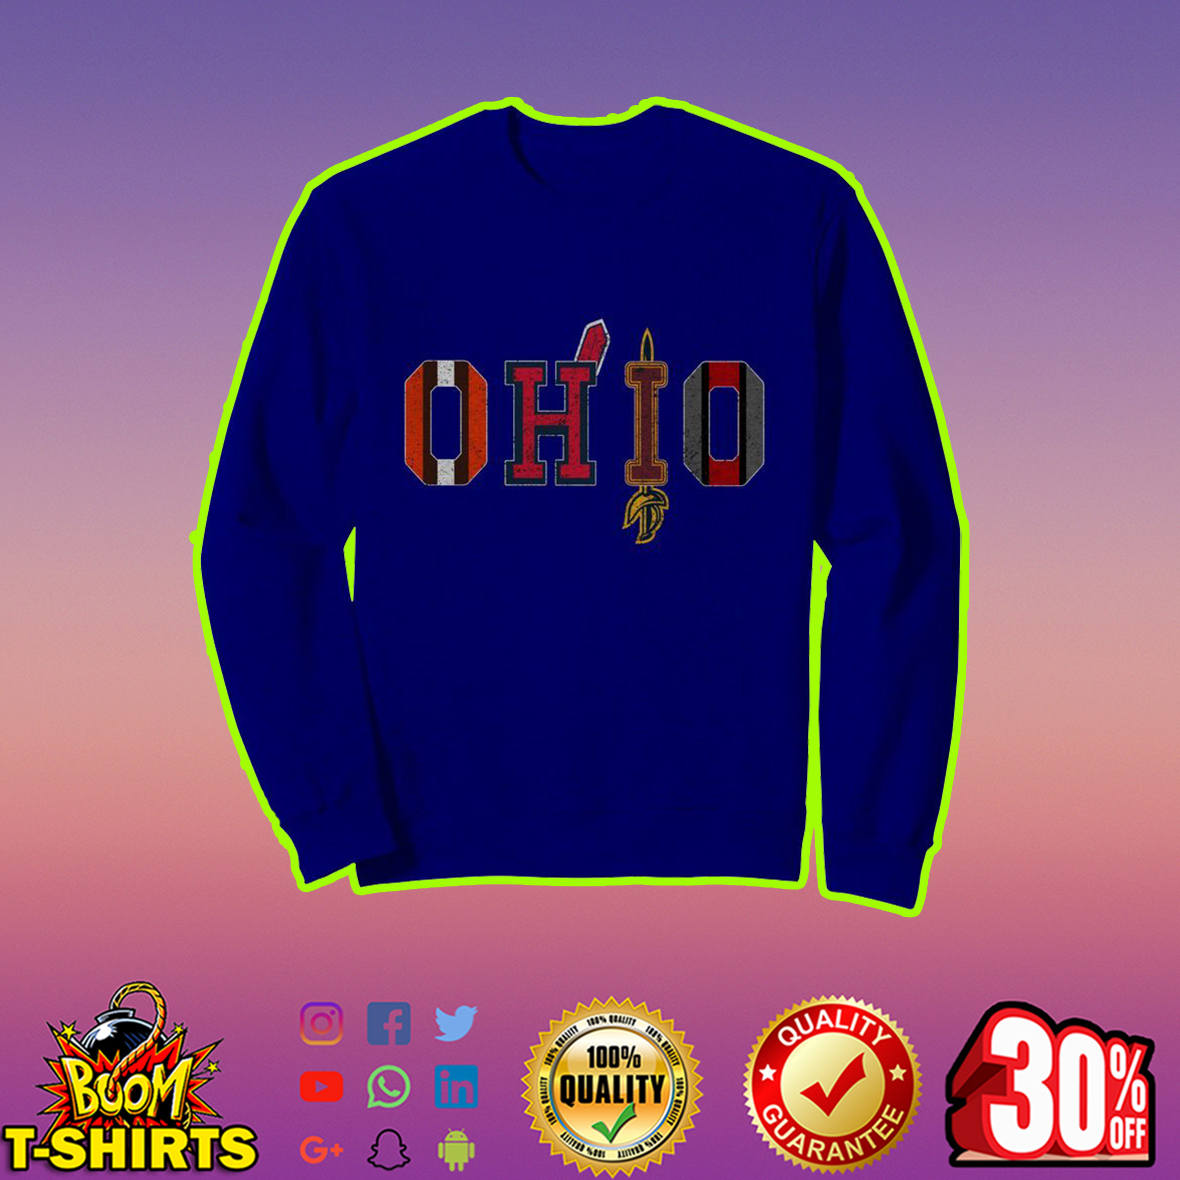 Ohio Teams Cleveland Browns Indians Cavaliers Ohio State sweatshirt